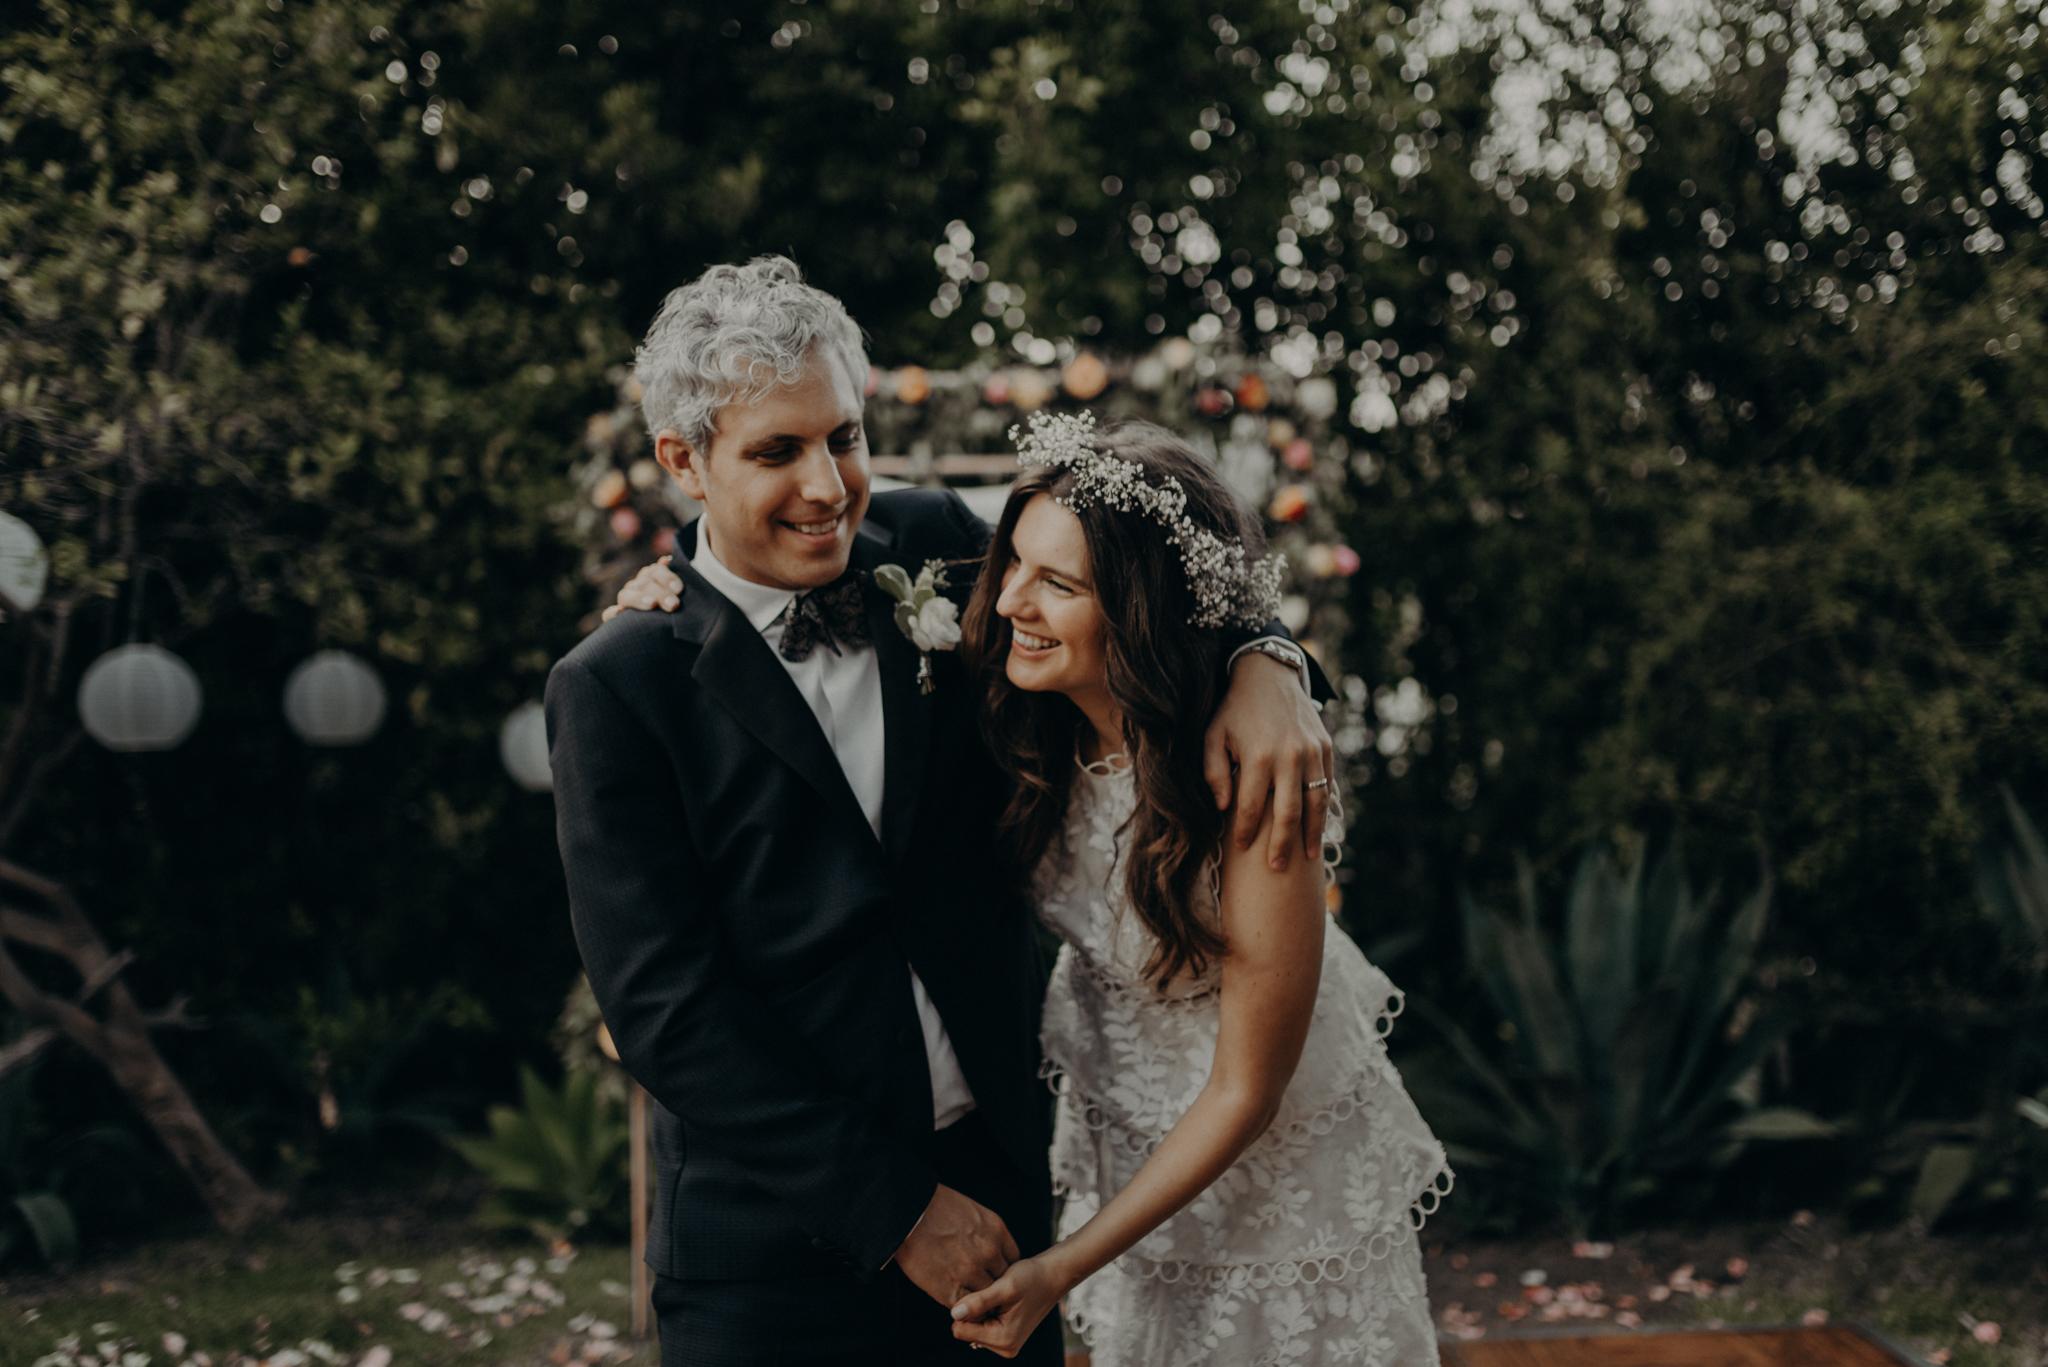 Isaiah + Taylor Photography - Private Estate Backyard Wedding - Beverly Hills - Los Angeles Wedding Photographer - 98.jpg